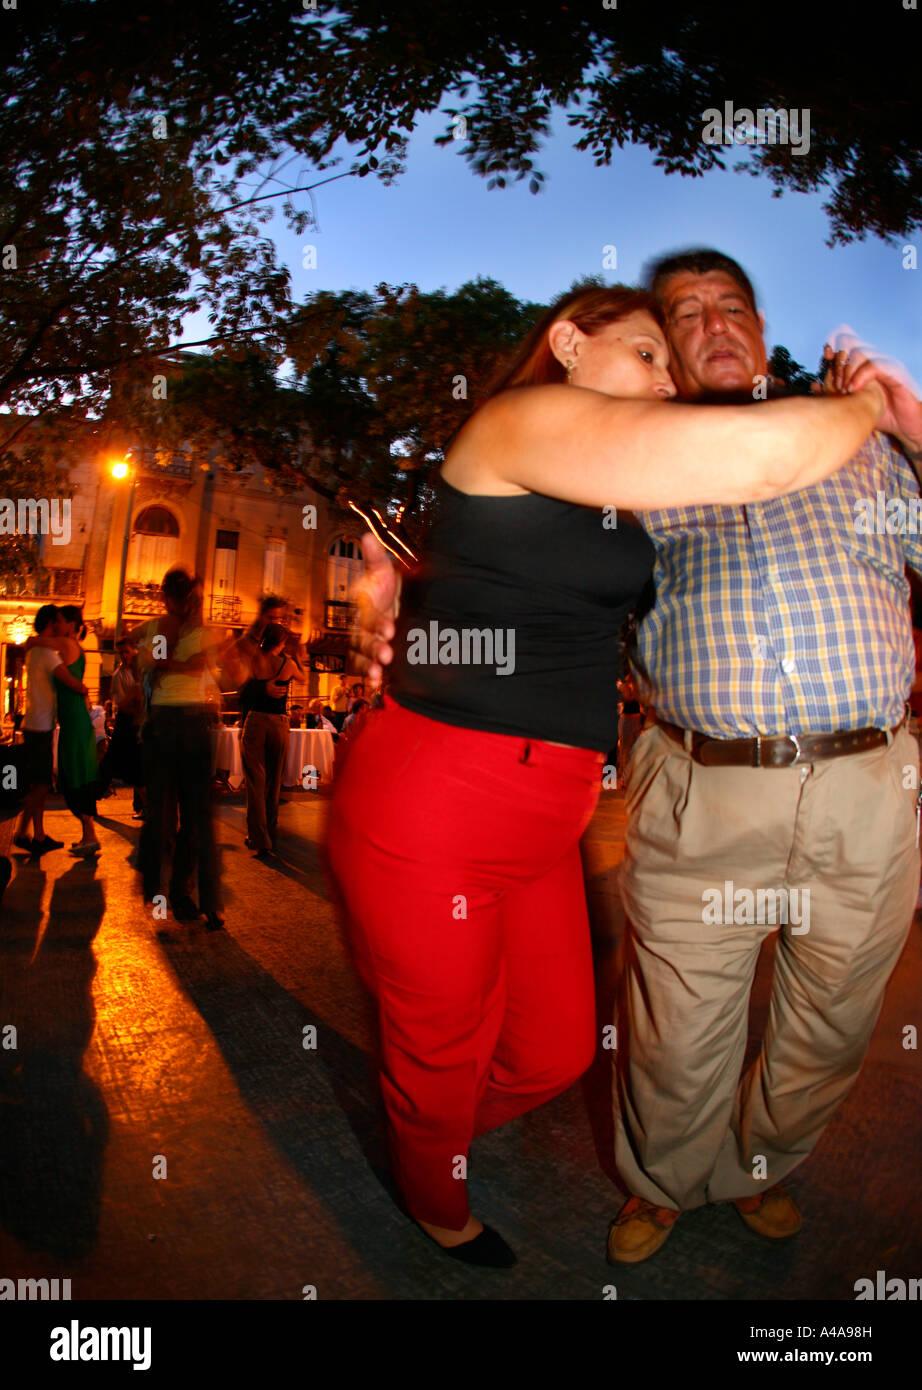 fette menschen tanzen